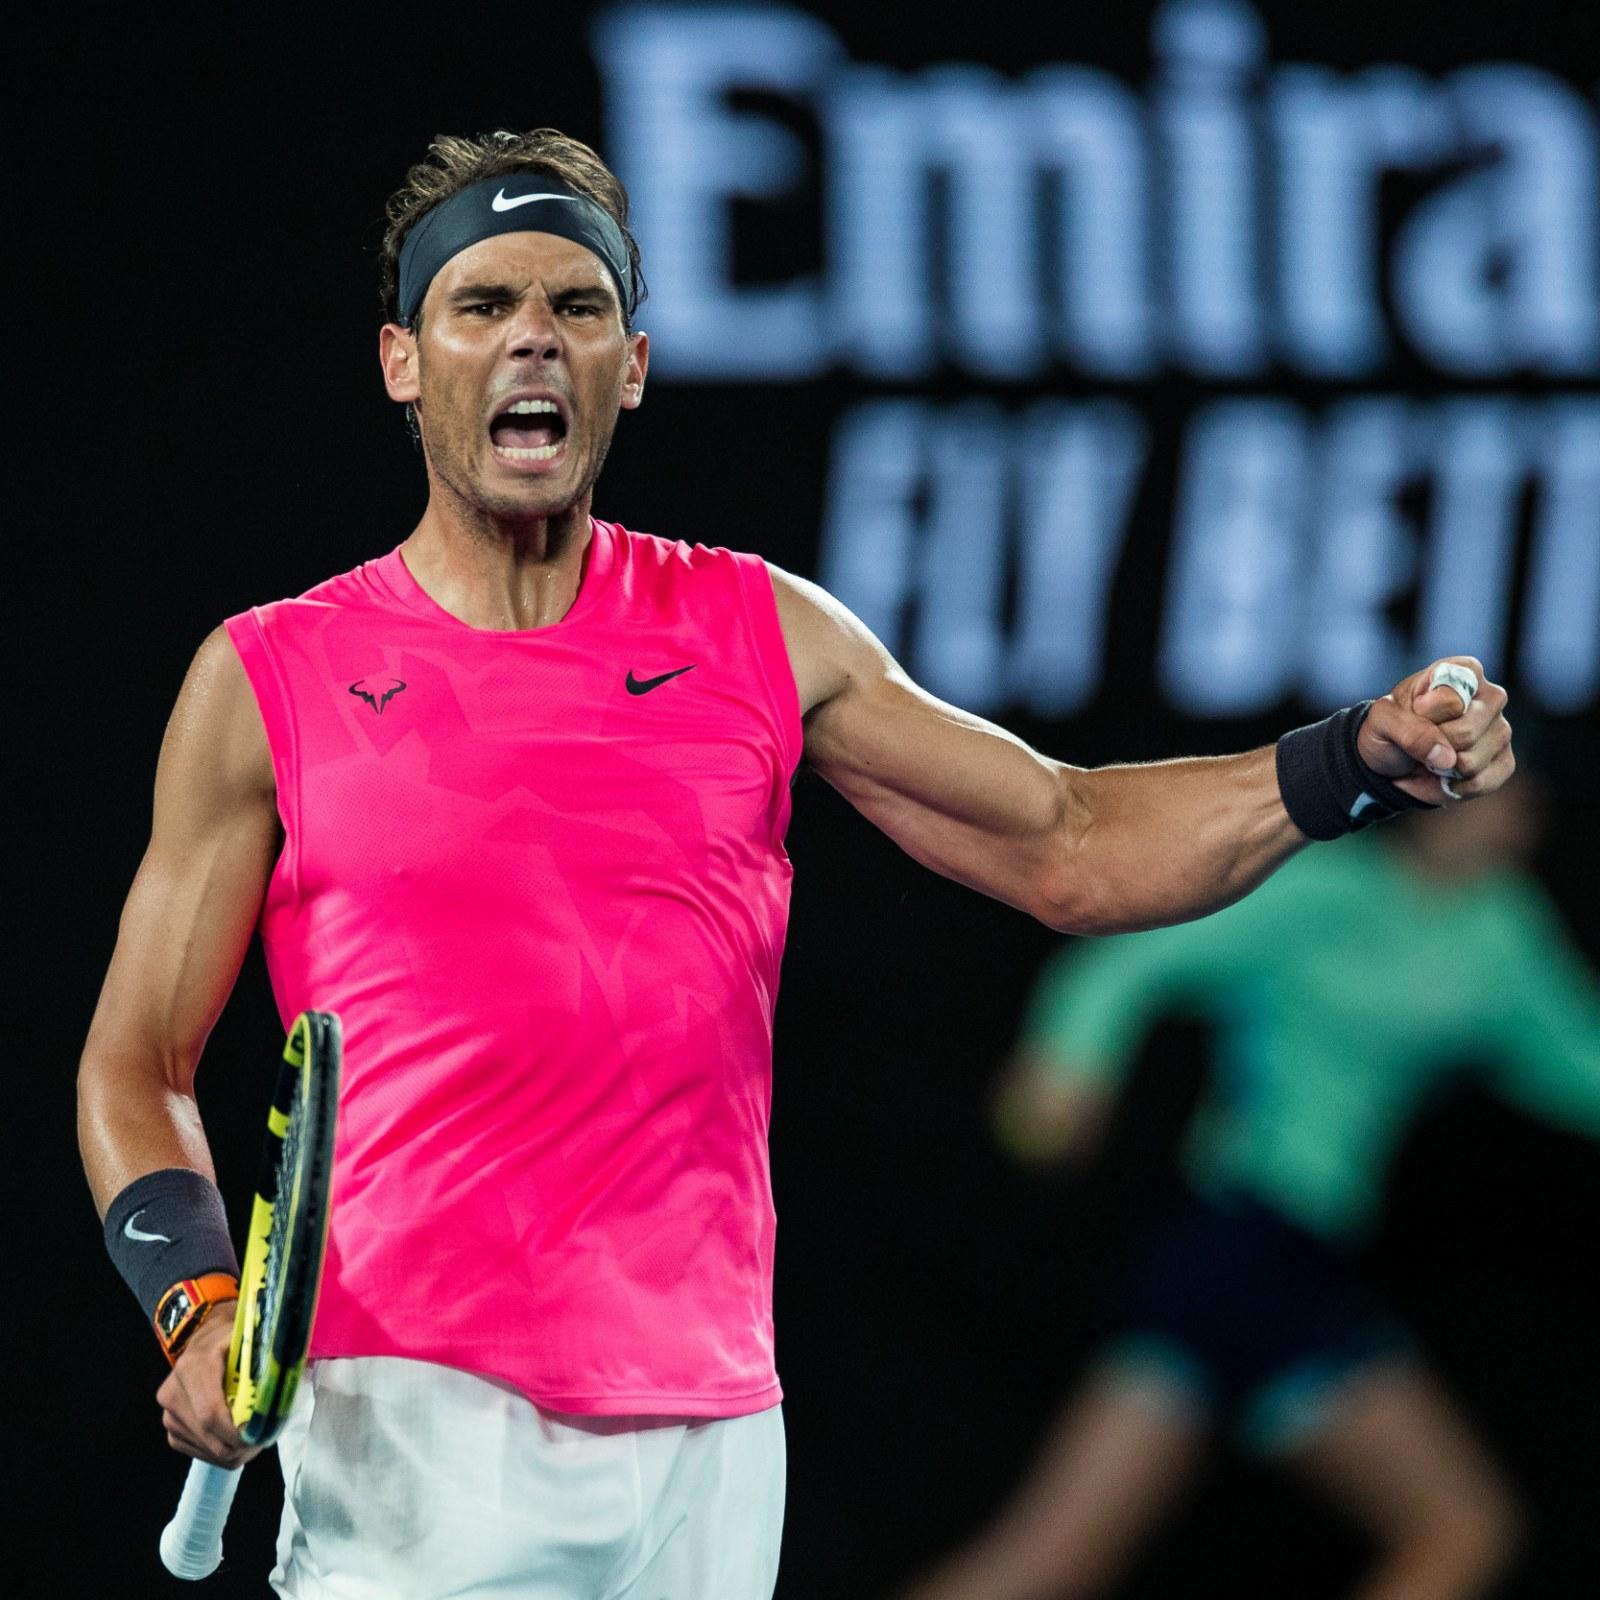 Australian Open 2020 Tv Schedule Where To Watch Rafael Nadal Third Round Match Start Time Live Stream